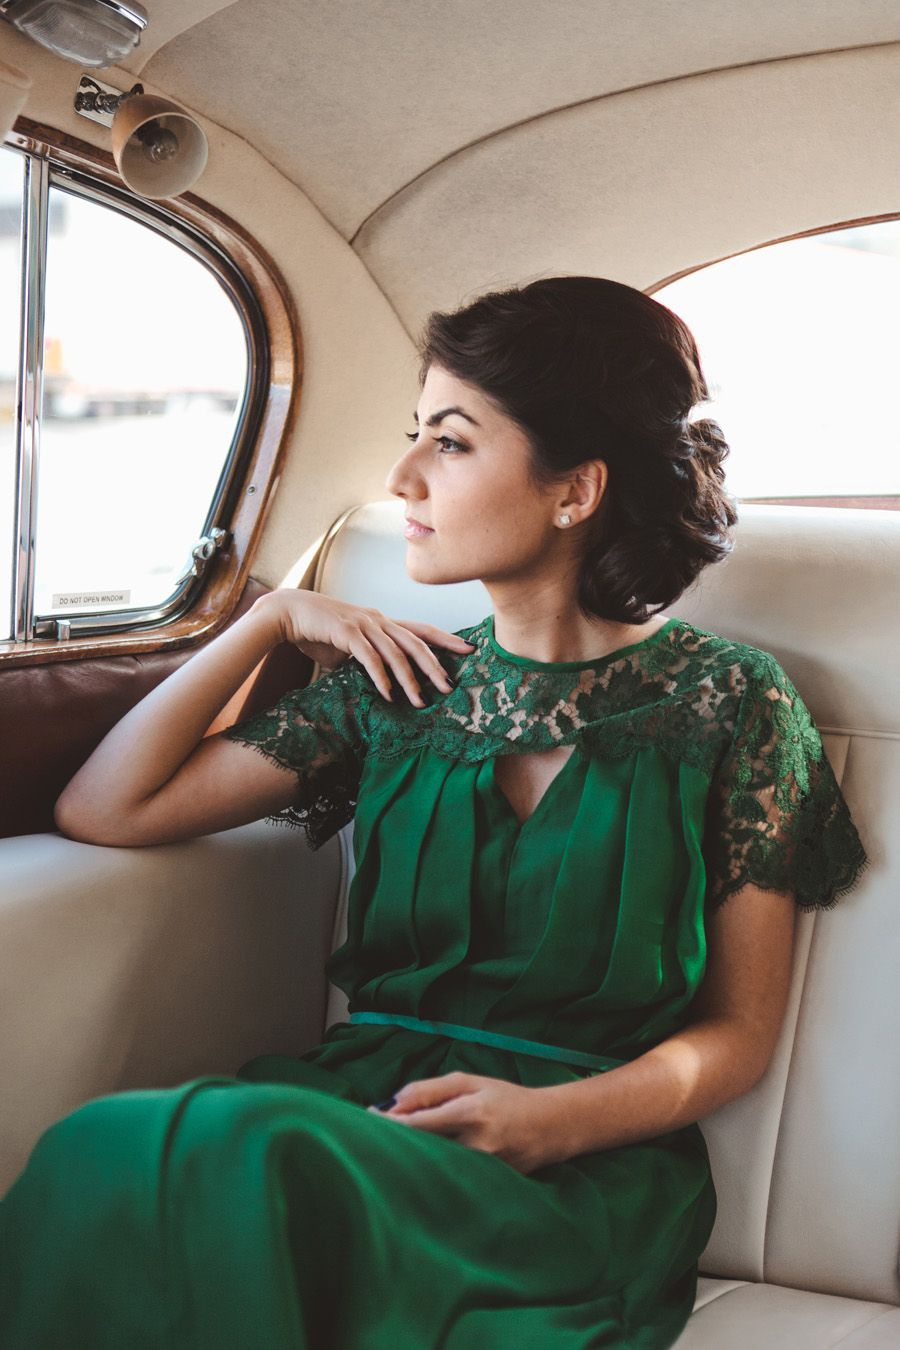 Emerald wedding dress  VINTAGE EMERALD GREEN WEDDING DRESS  I LOVE WEDNESDAYS